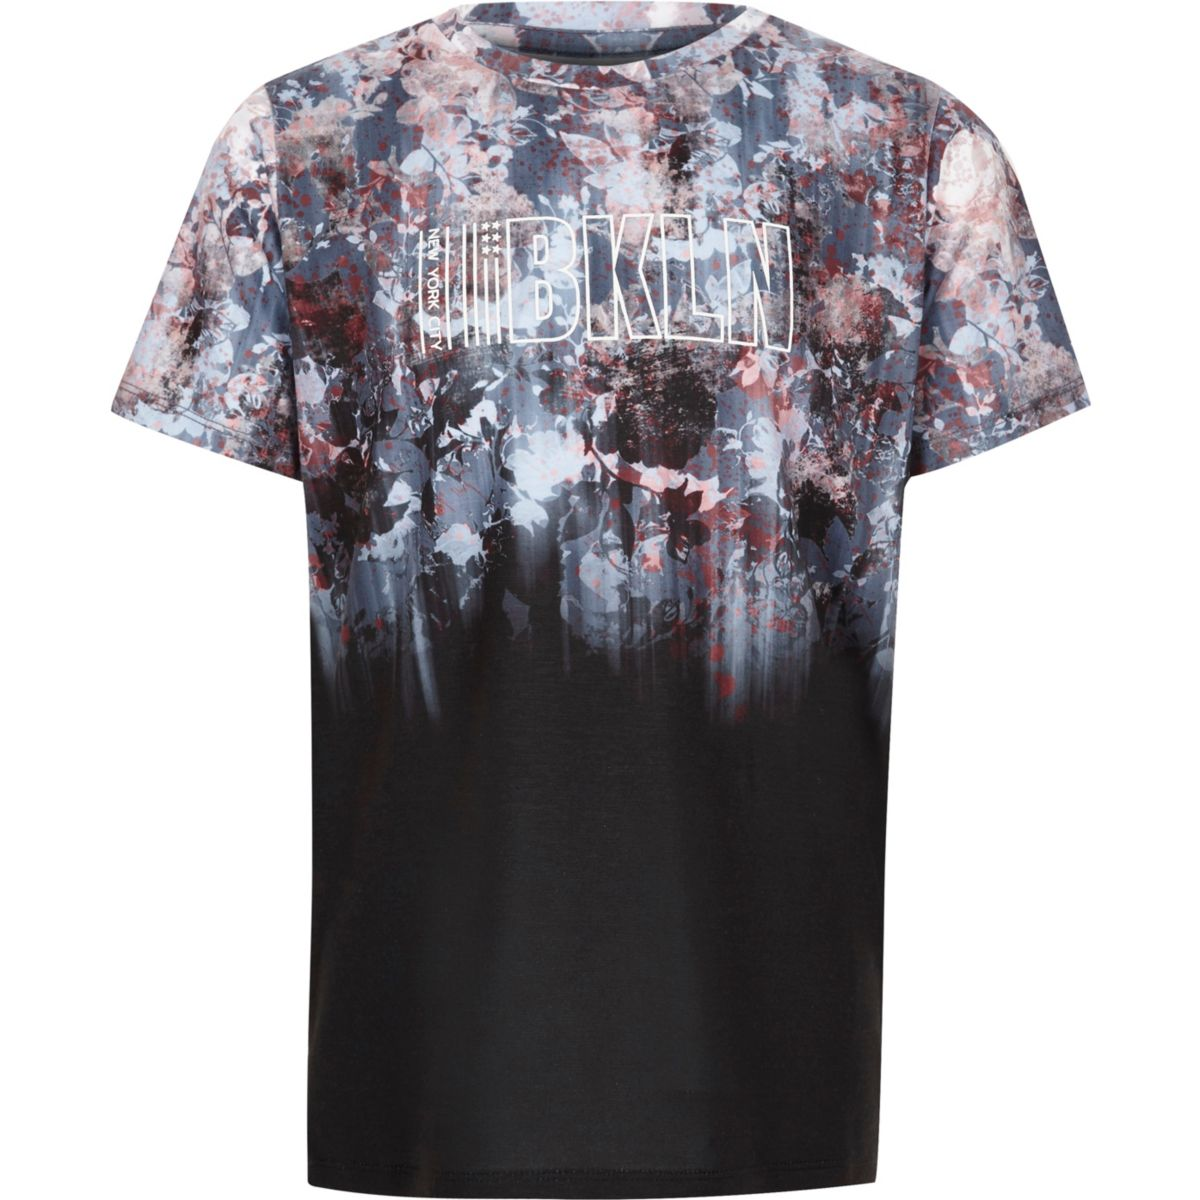 Boys black floral fade print 'Bkln' T-shirt